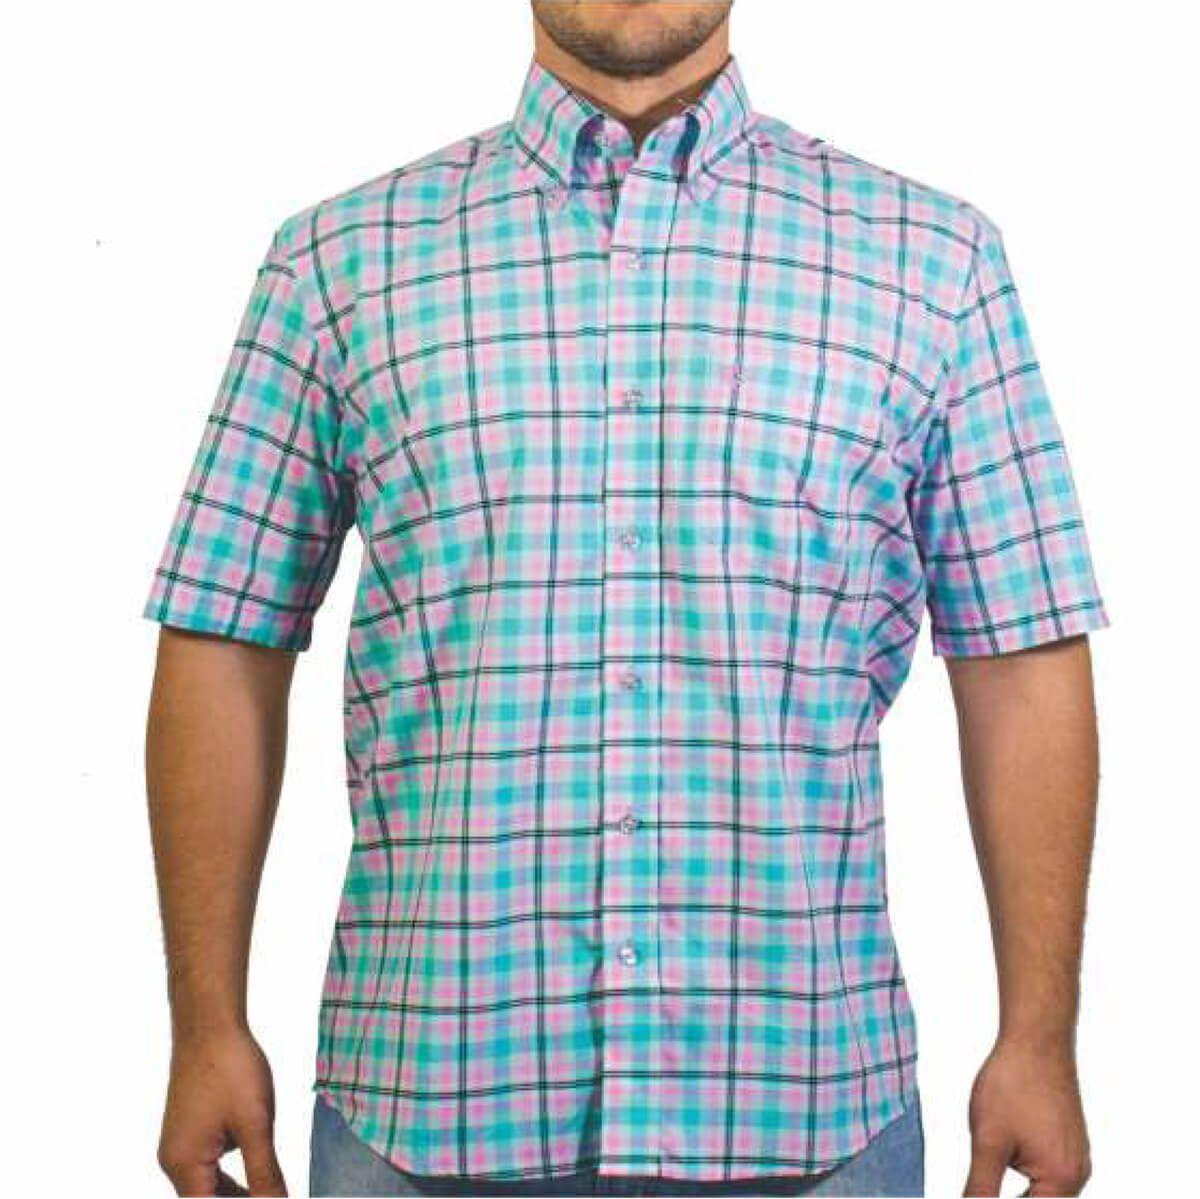 Camisa Tuff Masculina Xadrez Branca Listra Rosas E Verde - Arena Country  Echaporã 88f638d8949c8